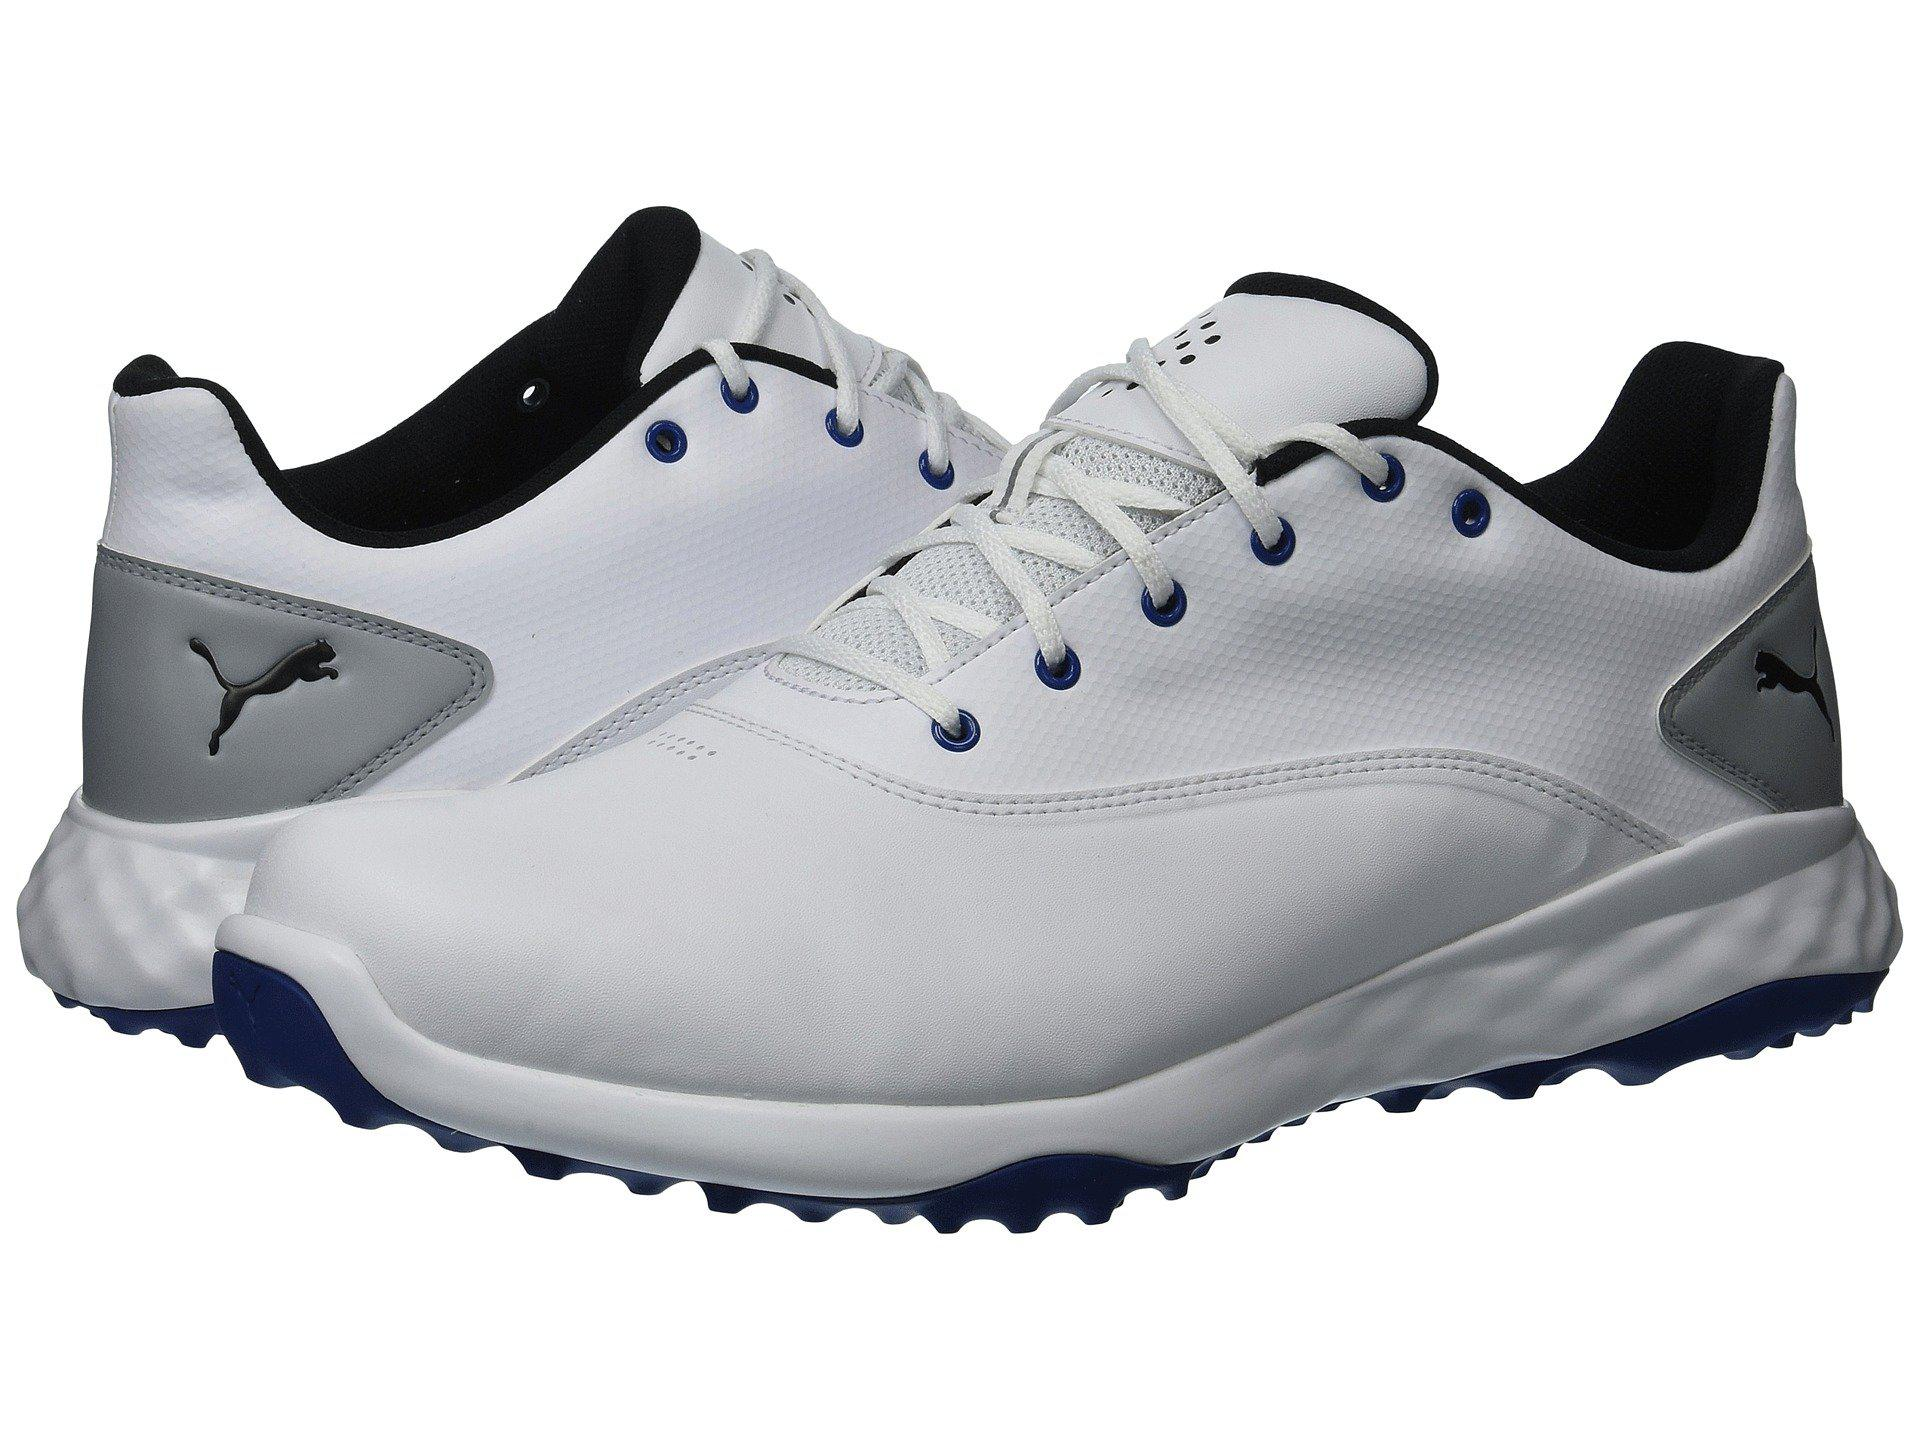 8d84a241496 PUMA. Grip Fusion (puma White quiet Shade puma Black) Men s Golf Shoes